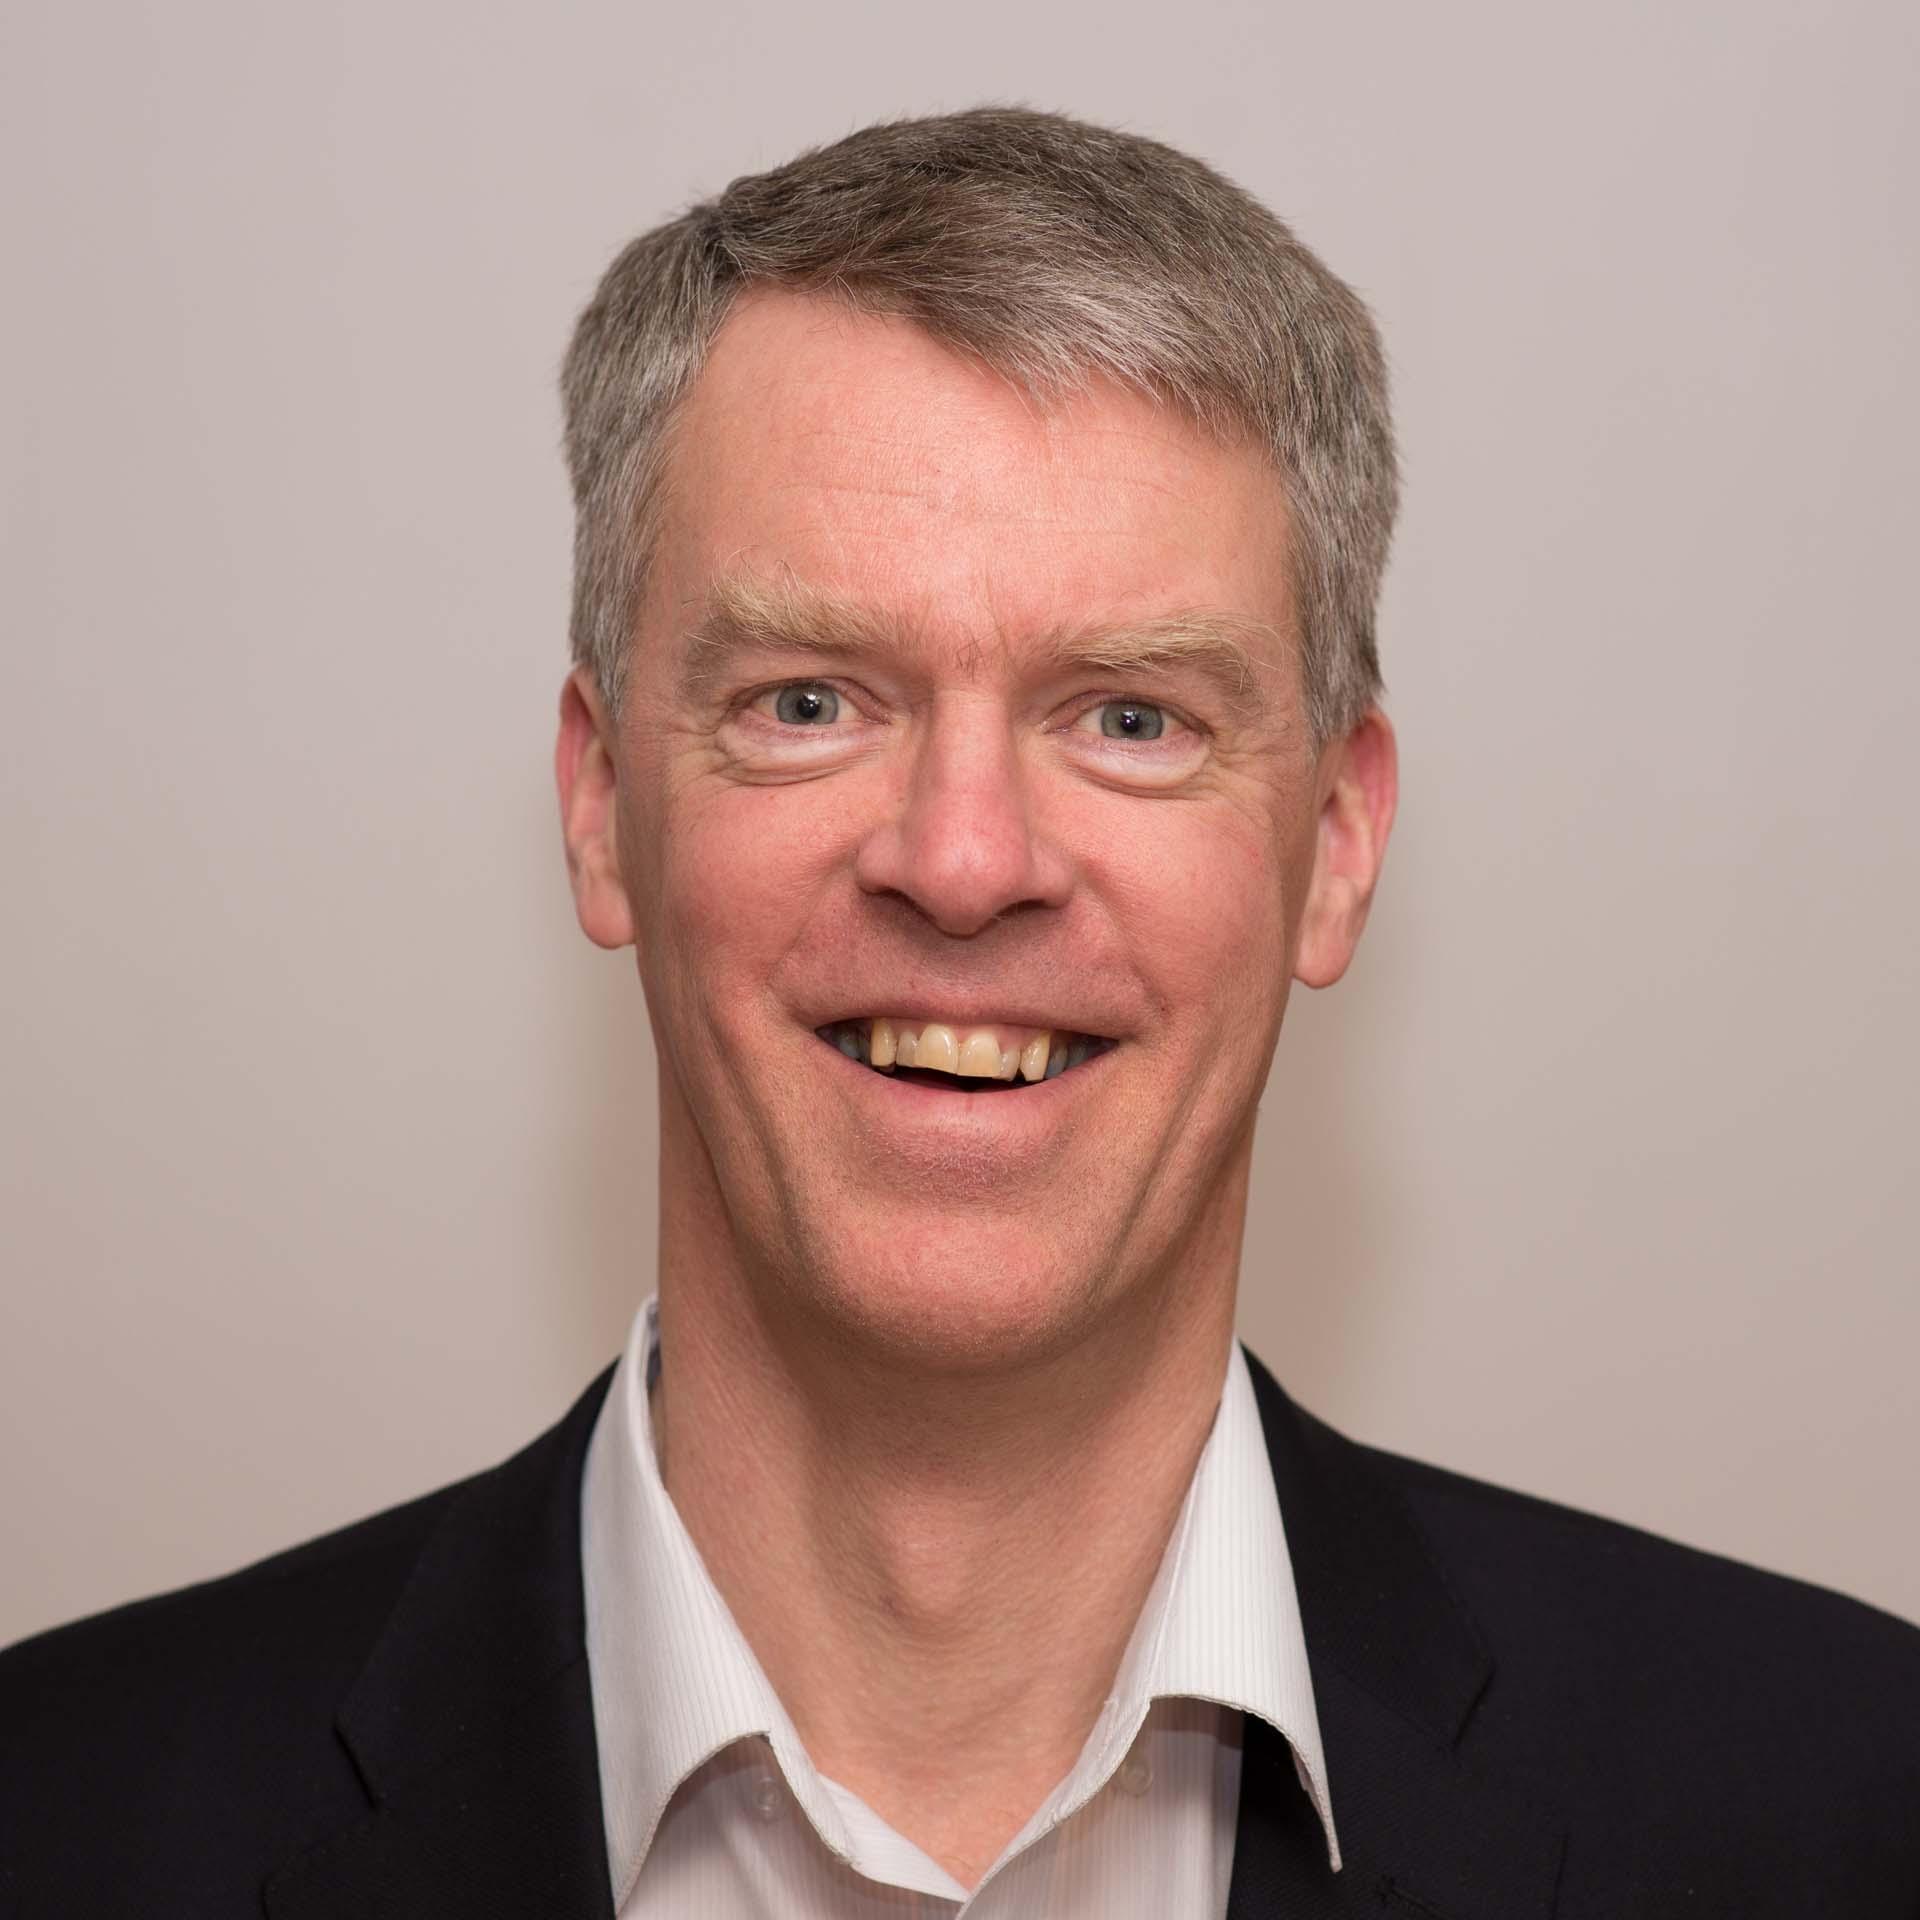 Sverre Slotte